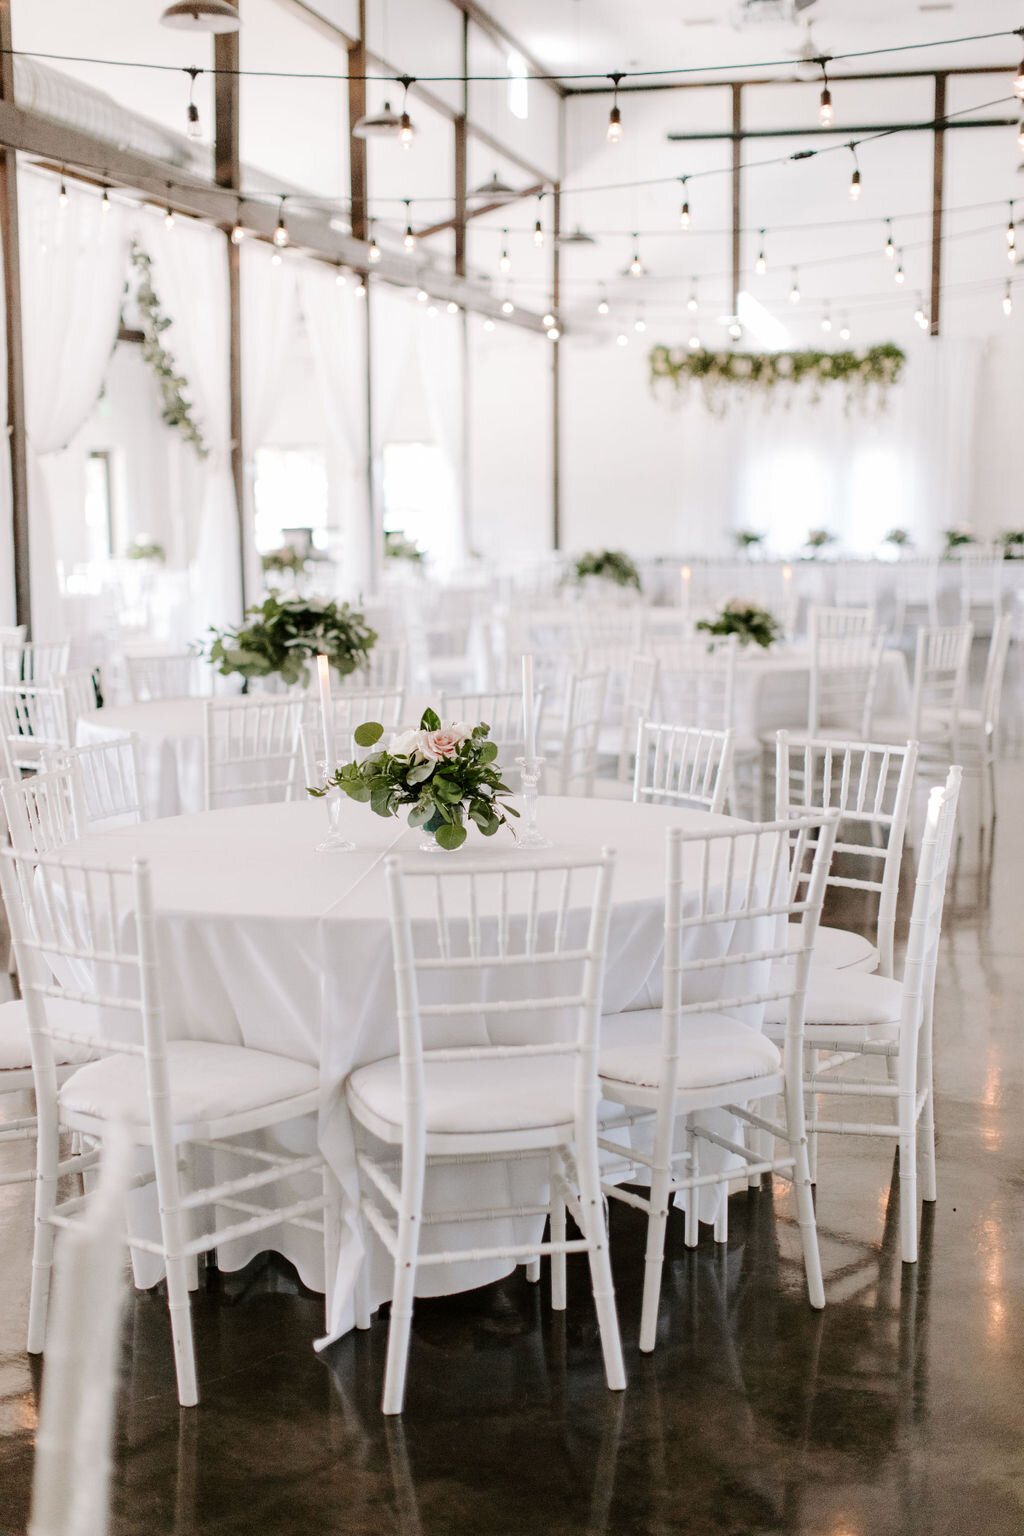 Tulsa White Barn Wedding Venue Outdoor Ceremony 8.JPG